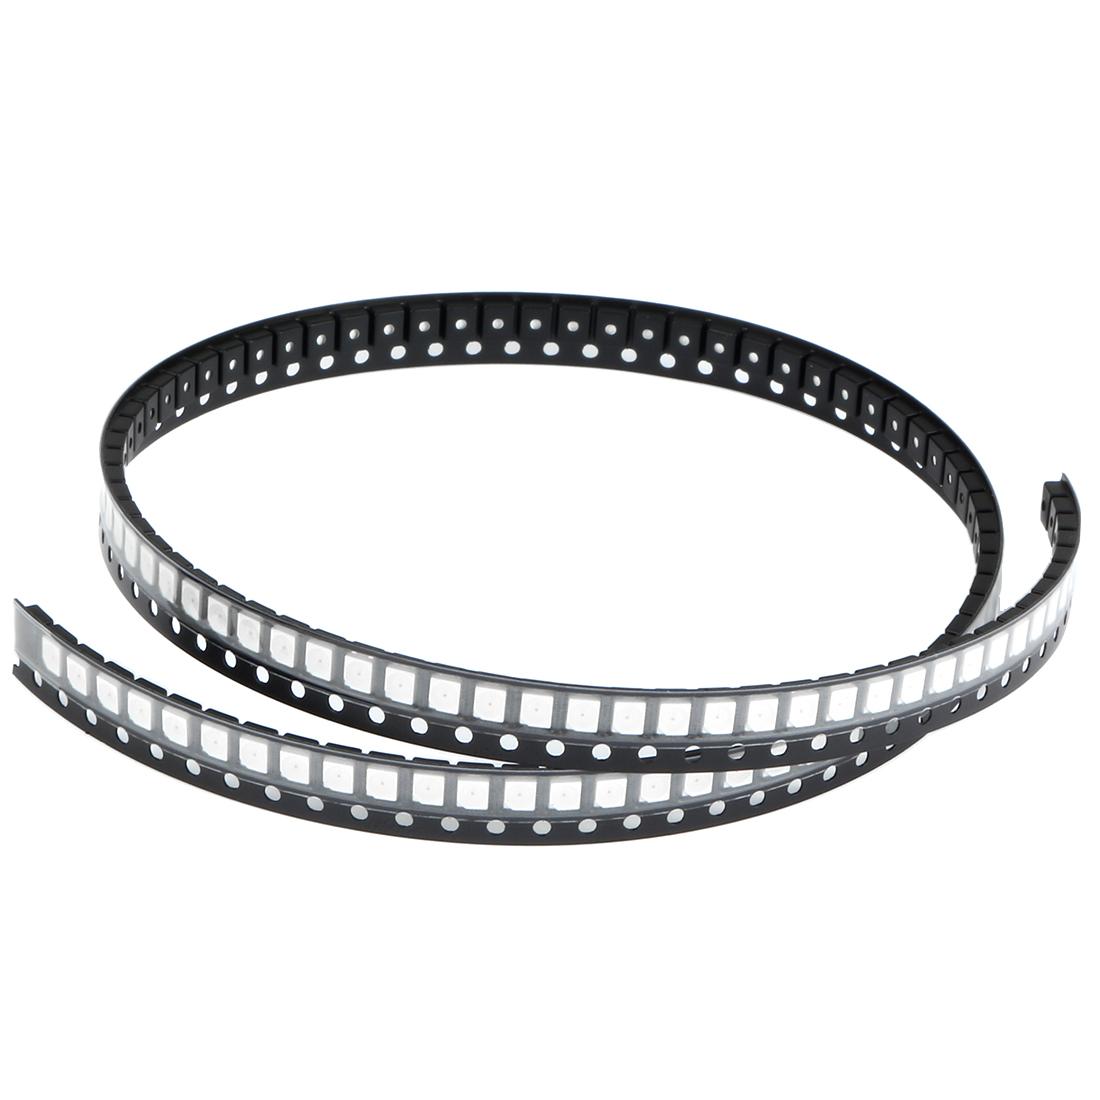 100pcs-Super-Bright-LED-Diode-Light-3528-3014-5050-5730-SMD-Light-Emitting-Diode thumbnail 29